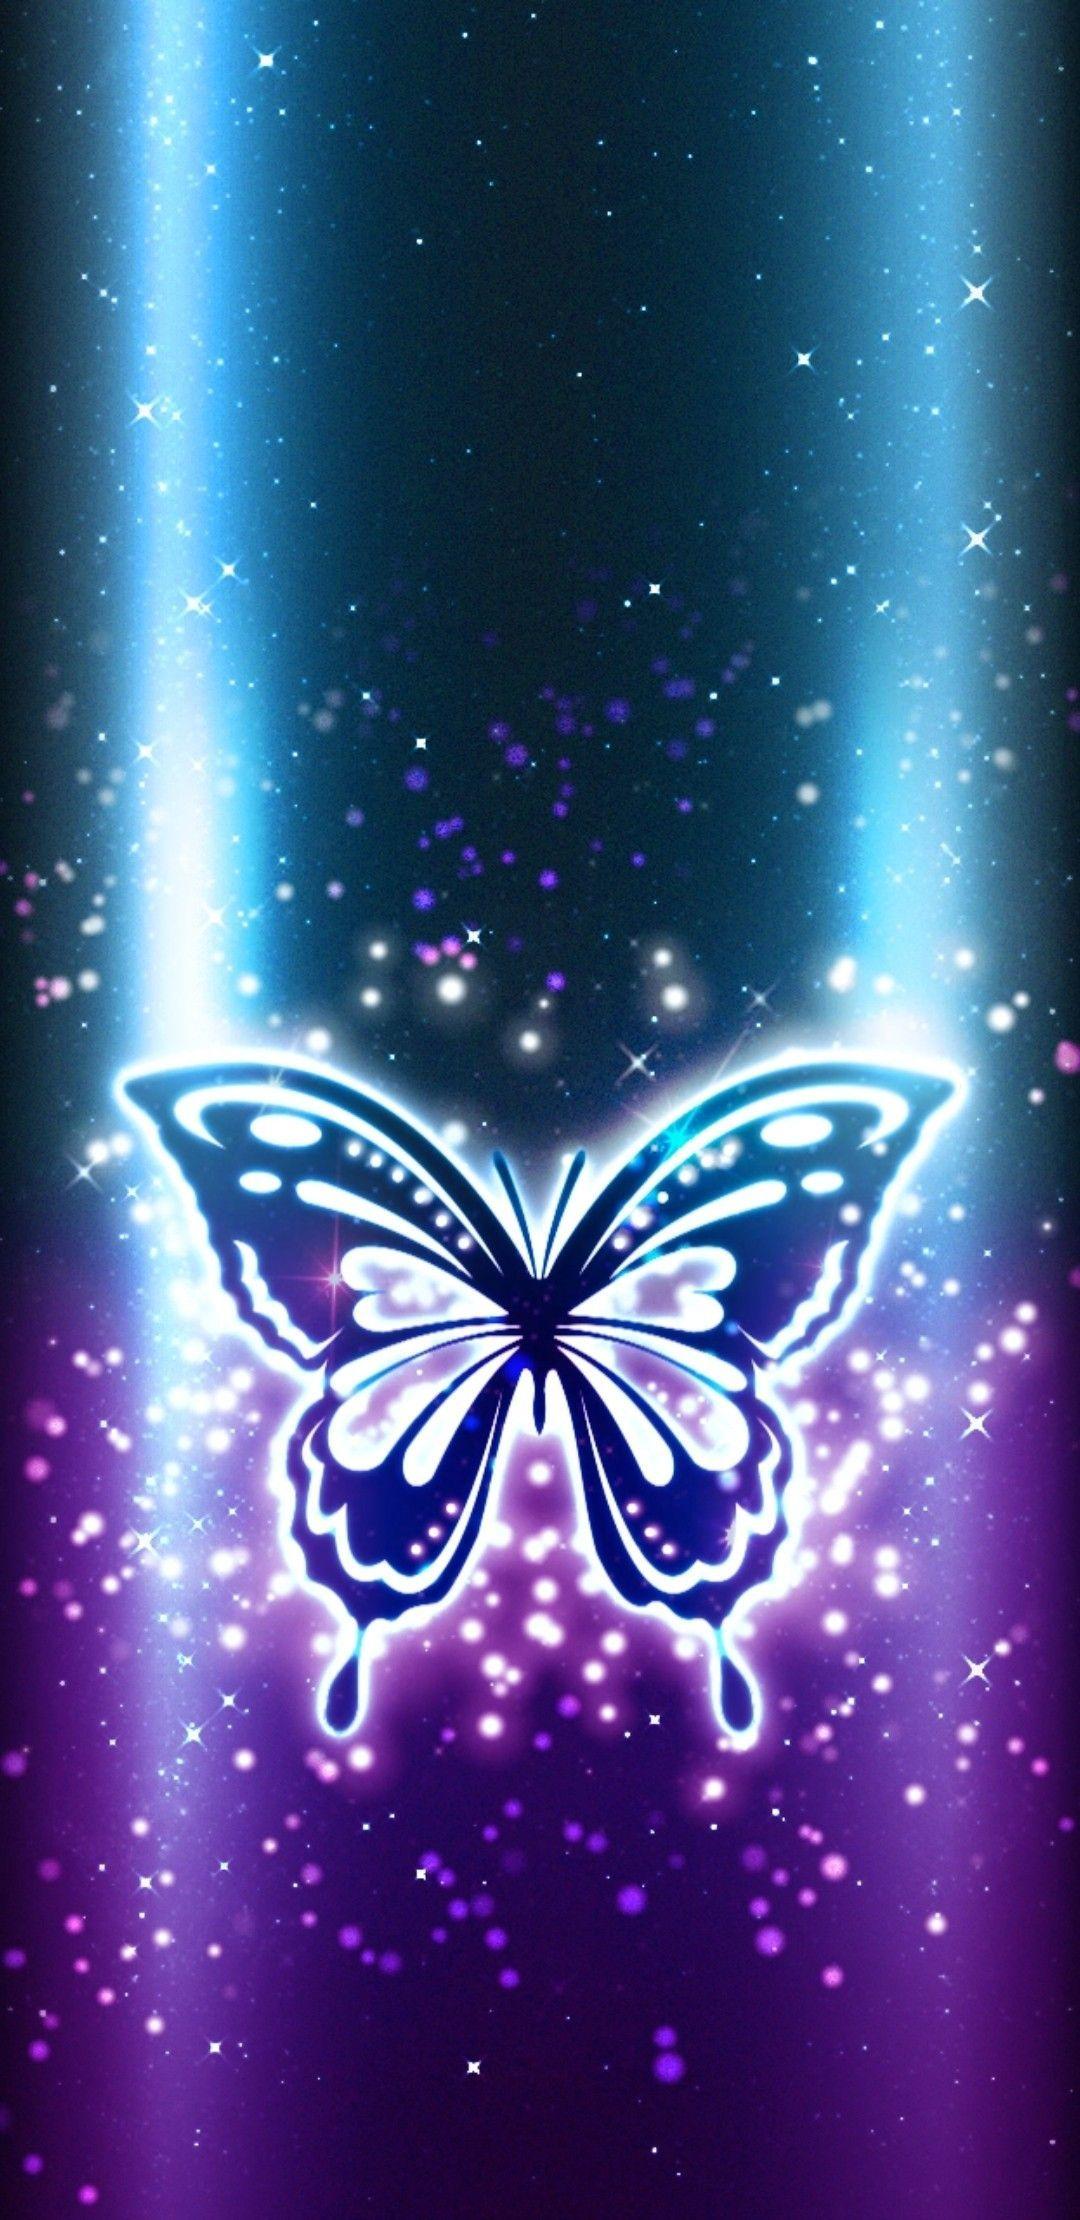 Purple Butterflies and Dragonflies Wallpapers on WallpaperDog